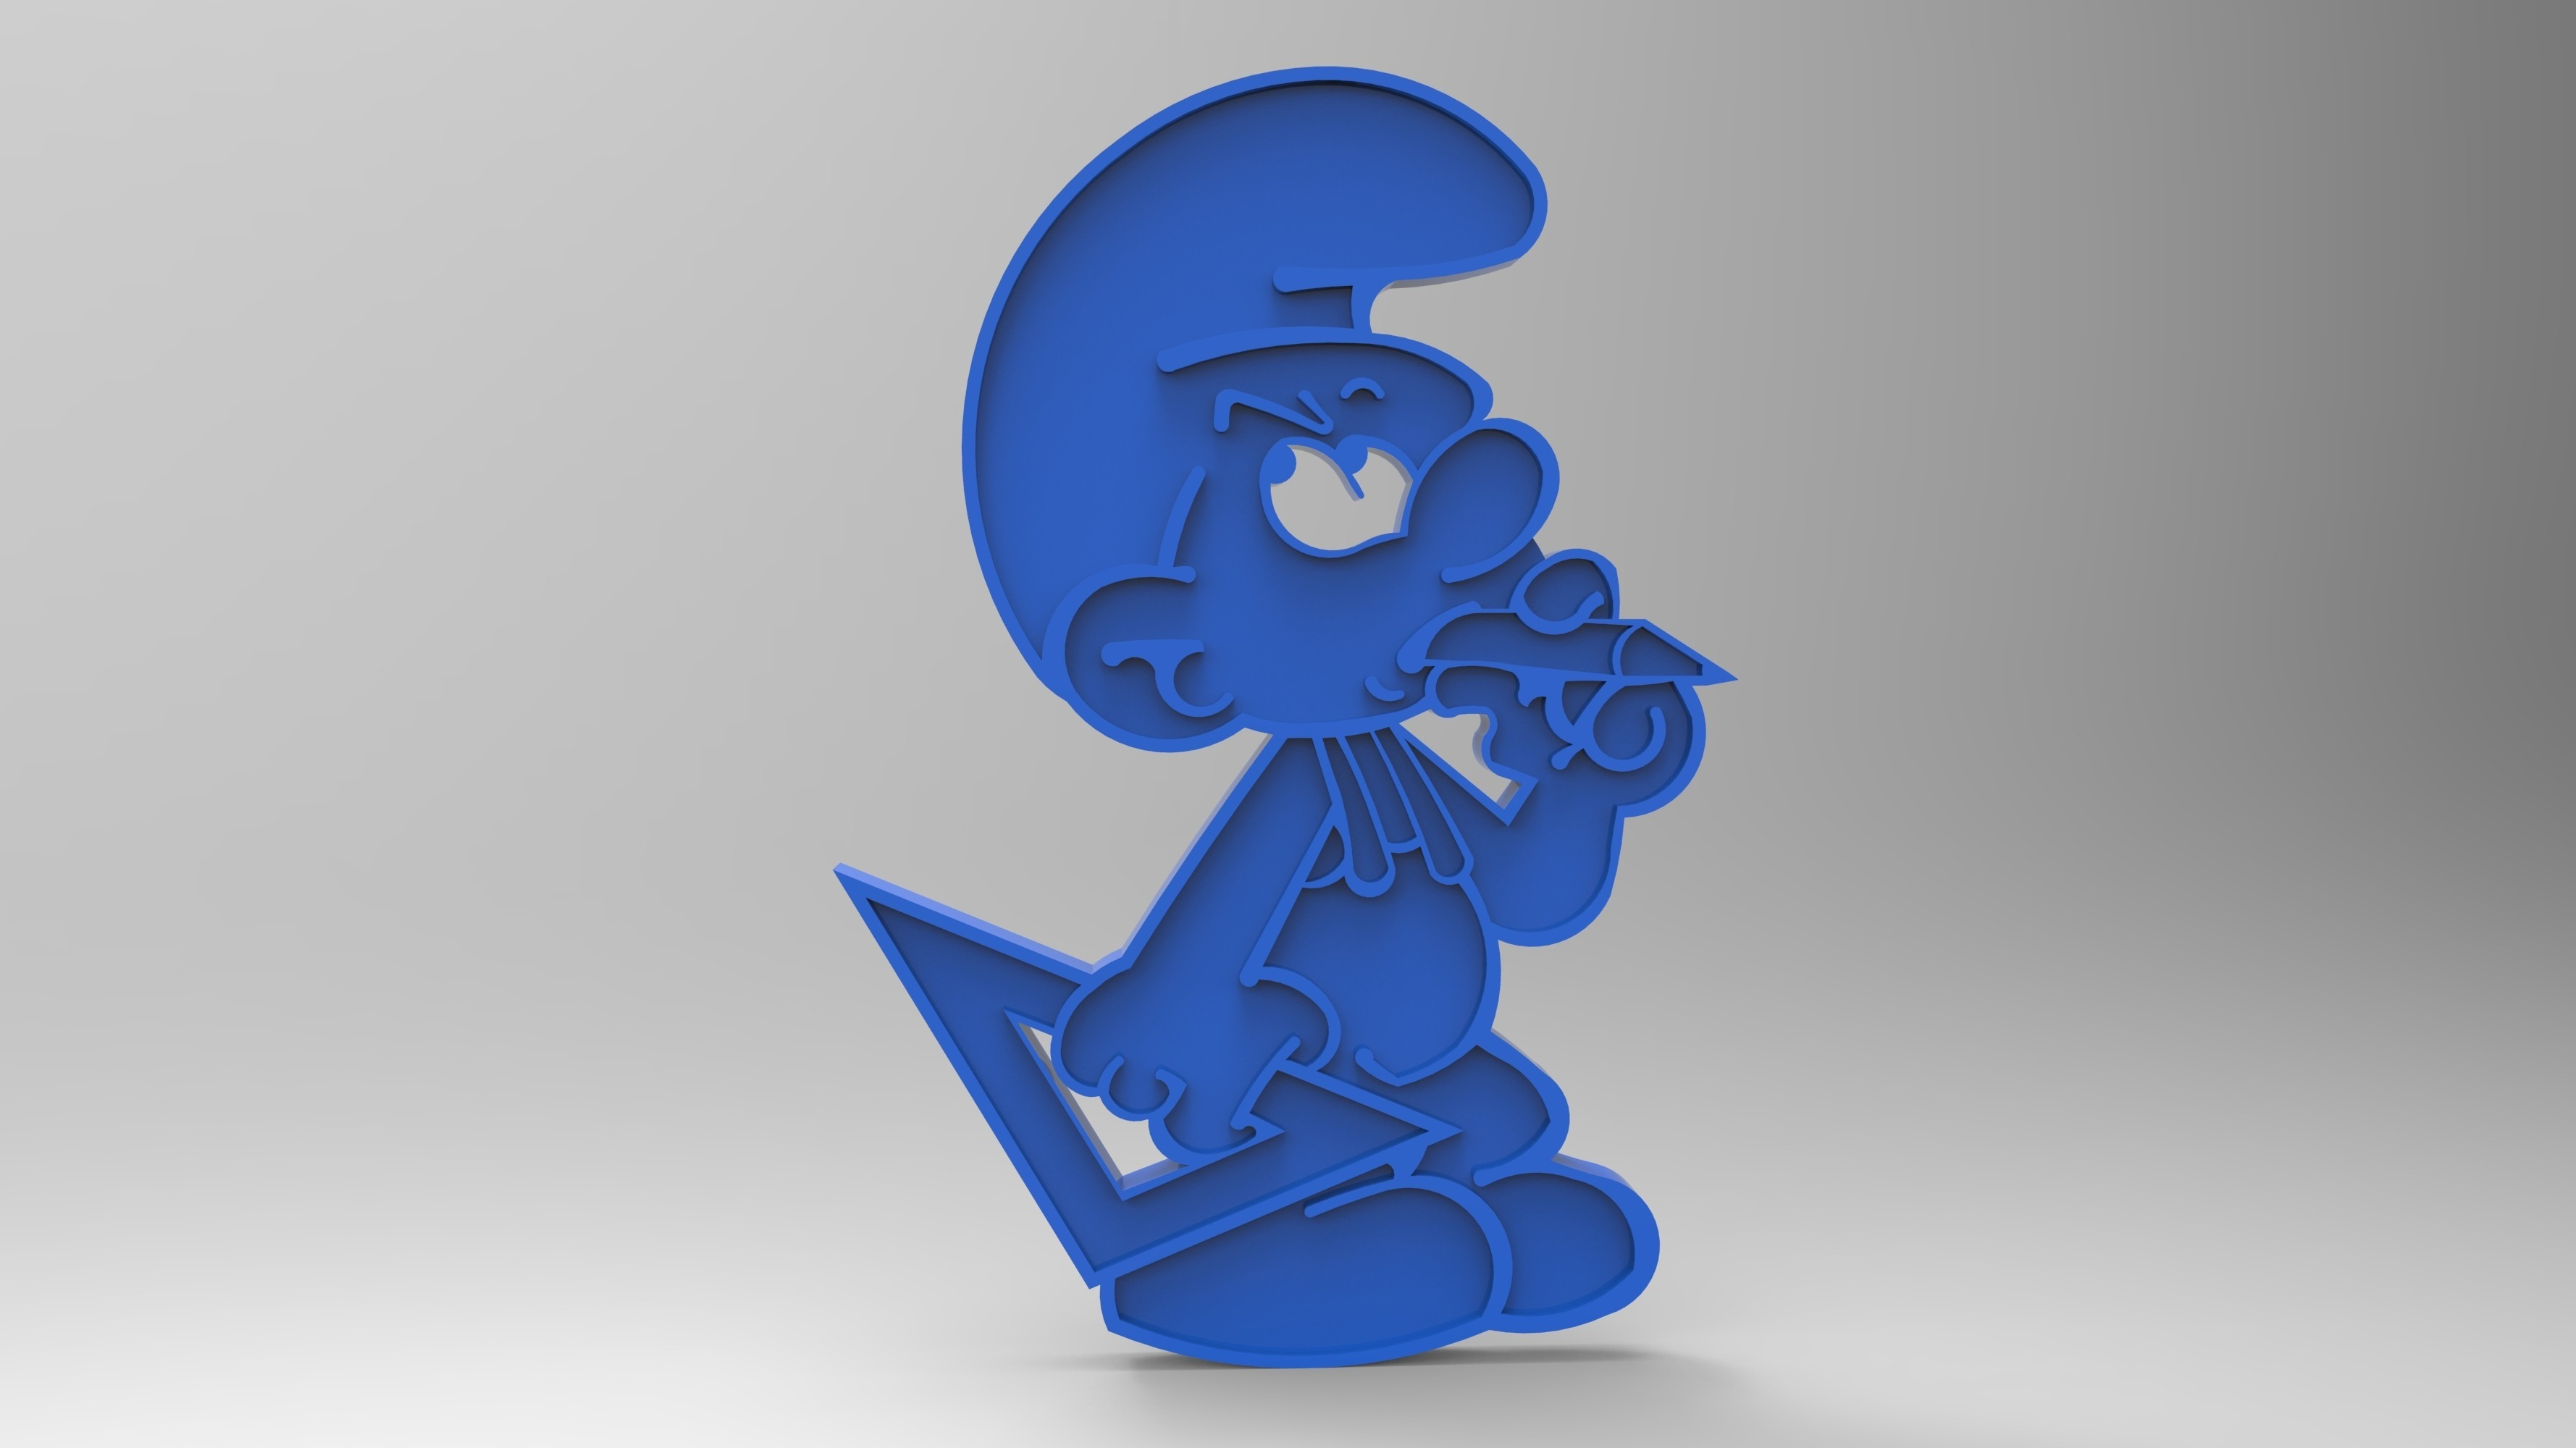 rendu schtroumpfs bricoleur plastique bleu face.jpg Download free STL file smurf peyo smurf do-it-yourself smurf figurine key ring • Design to 3D print, GuilhemPerroud